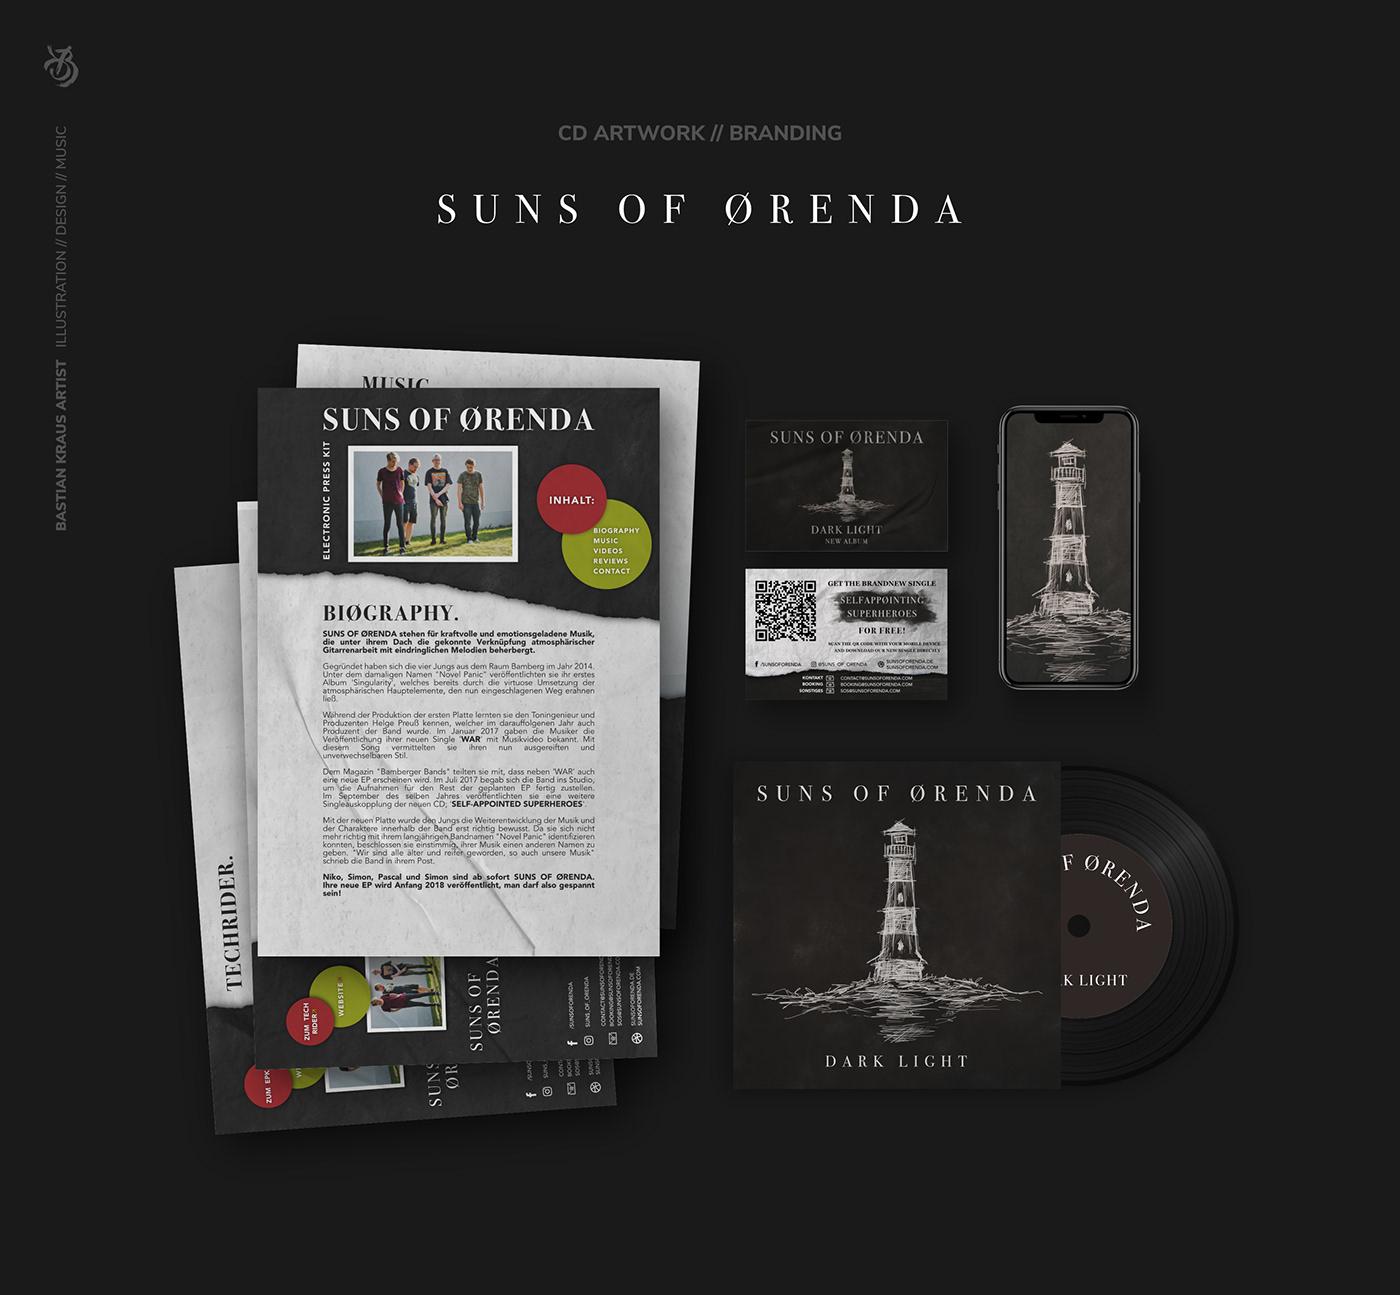 Suns Of Ørenda // CD Artwork